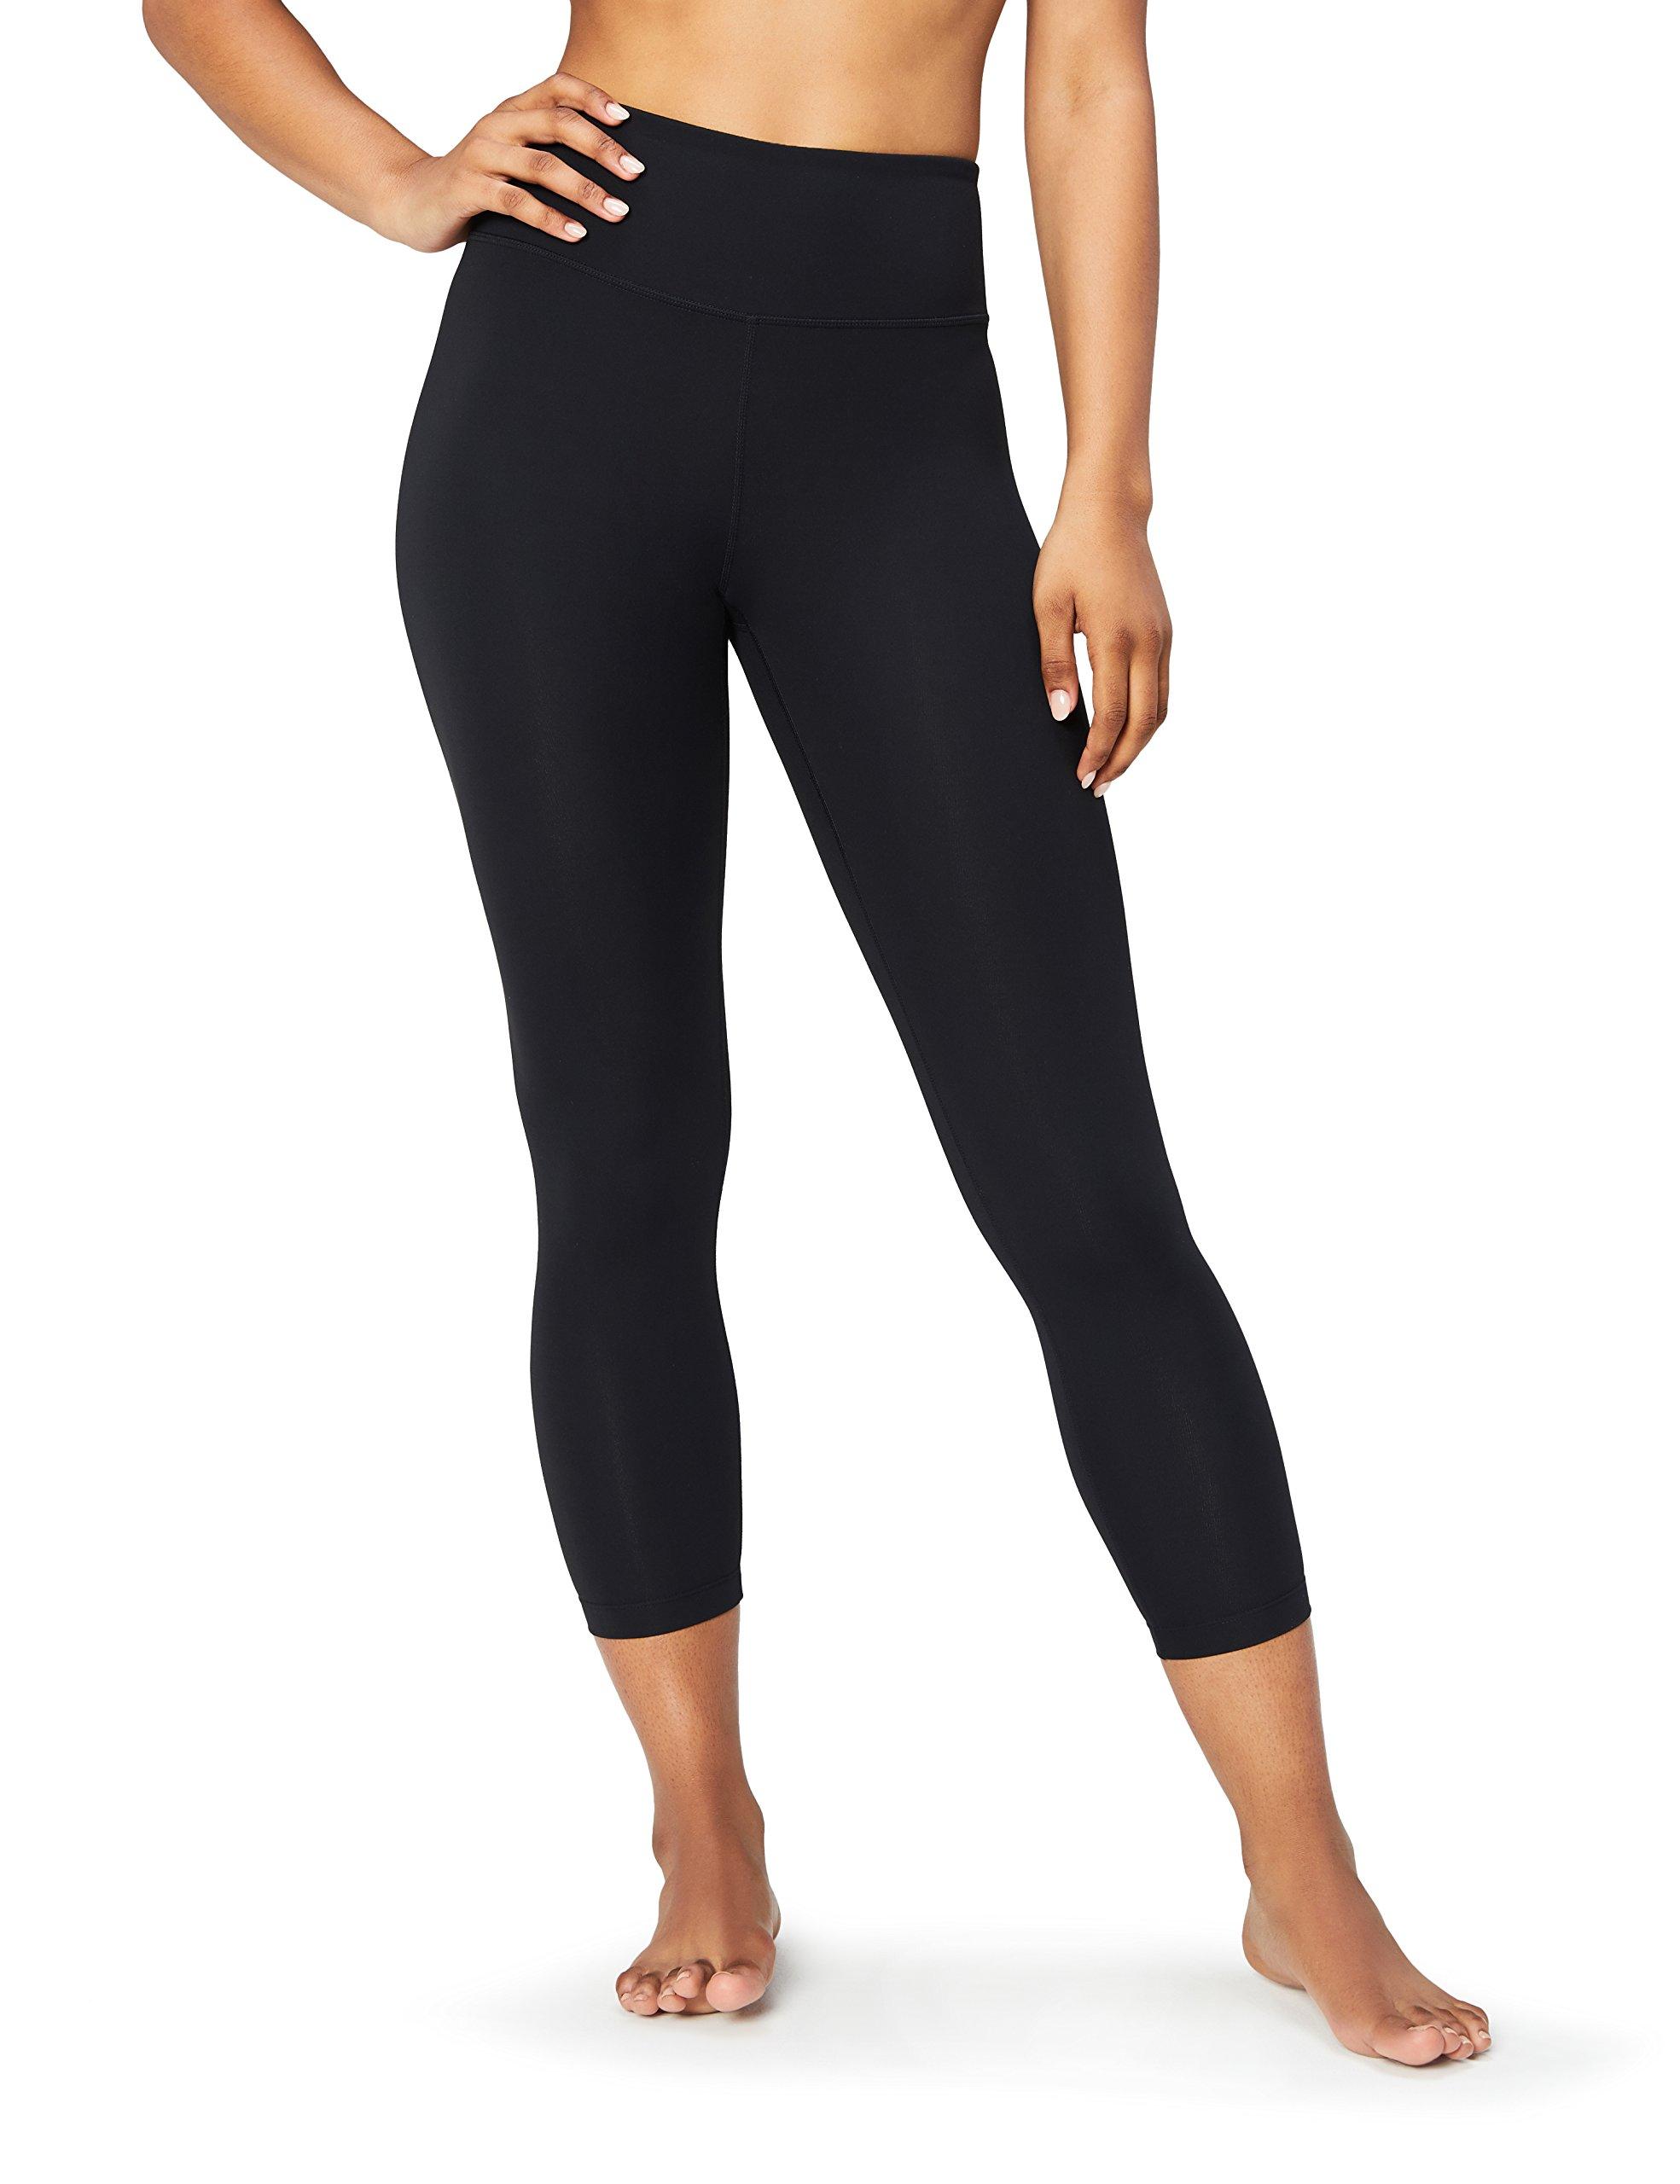 Core 10 Women's Spectrum High Waist Yoga 7/8 Crop Legging - 24'', Black, Large